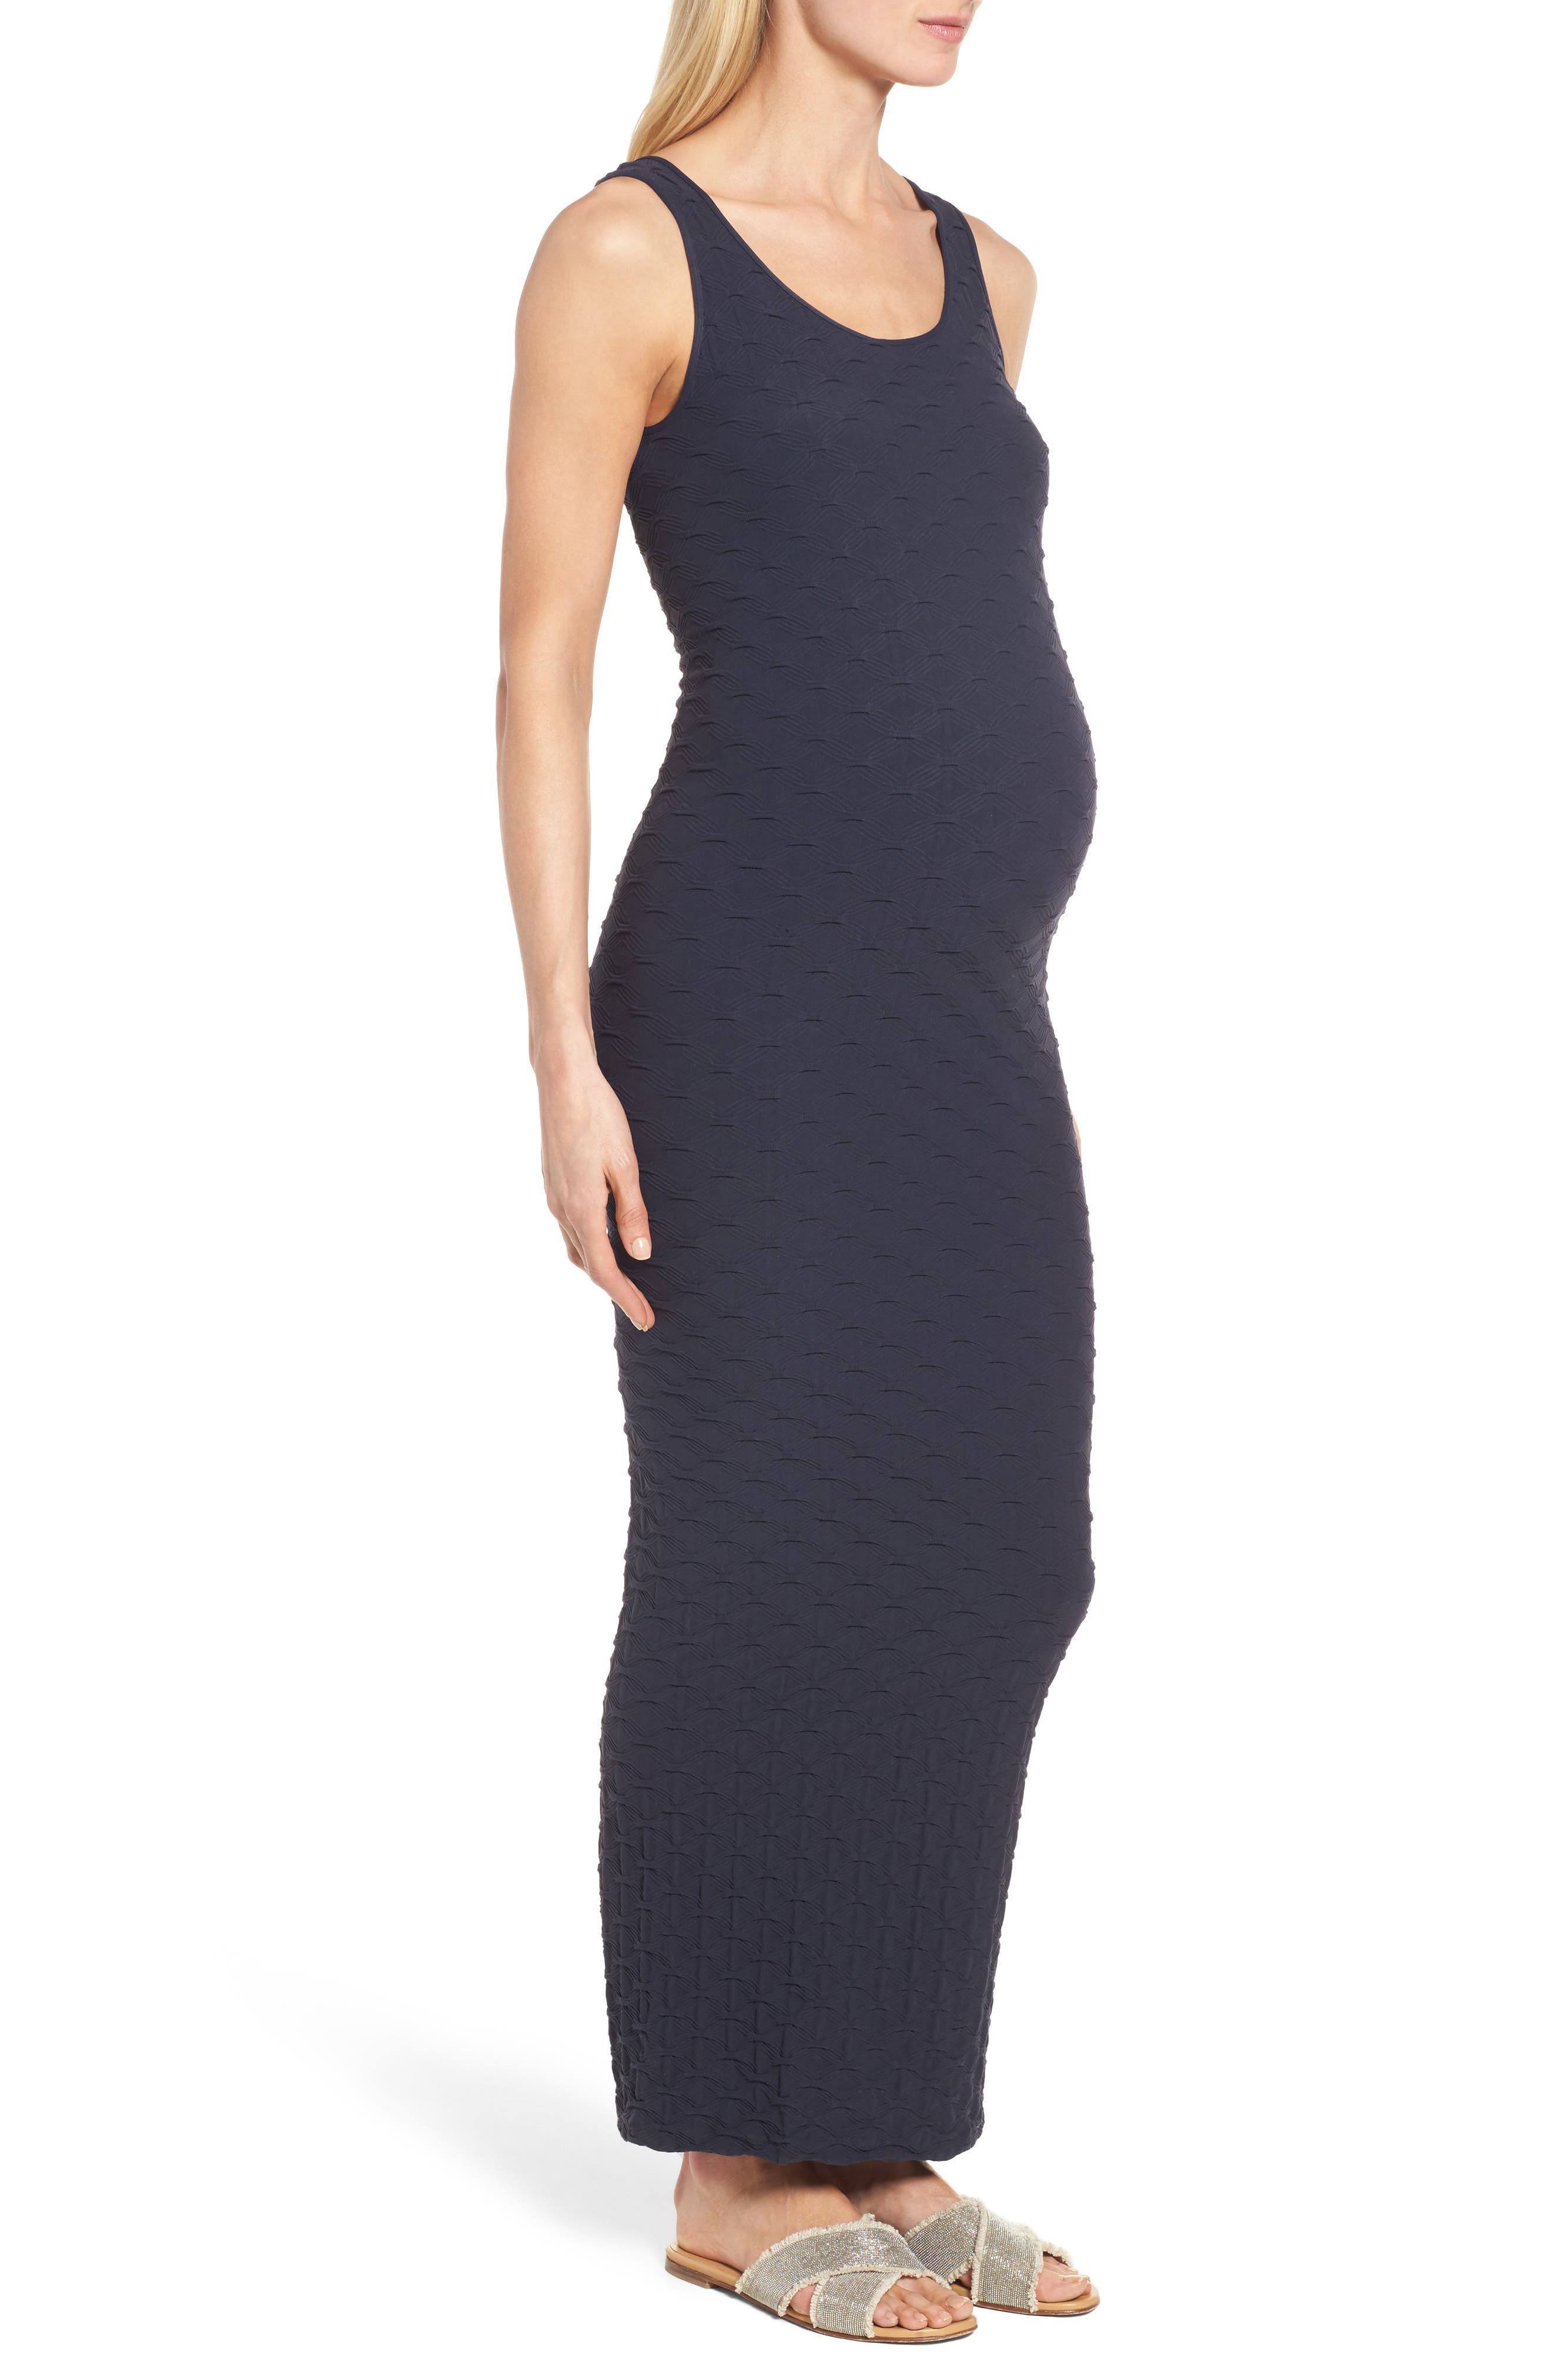 'Lattice' Maxi Maternity Dress,                             Alternate thumbnail 3, color,                             020